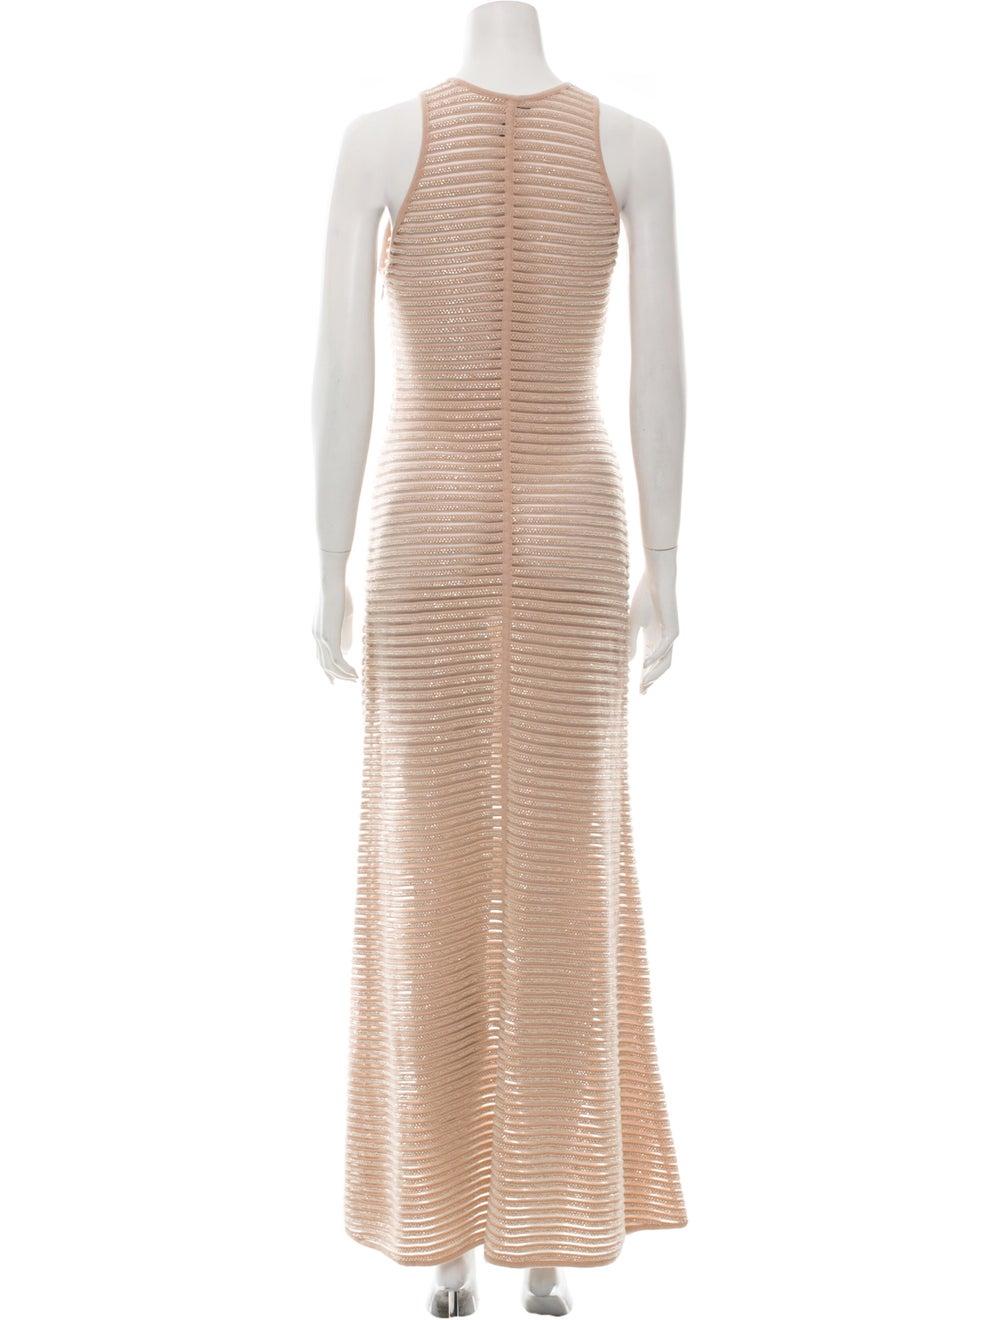 Halston Vintage Long Dress - image 3